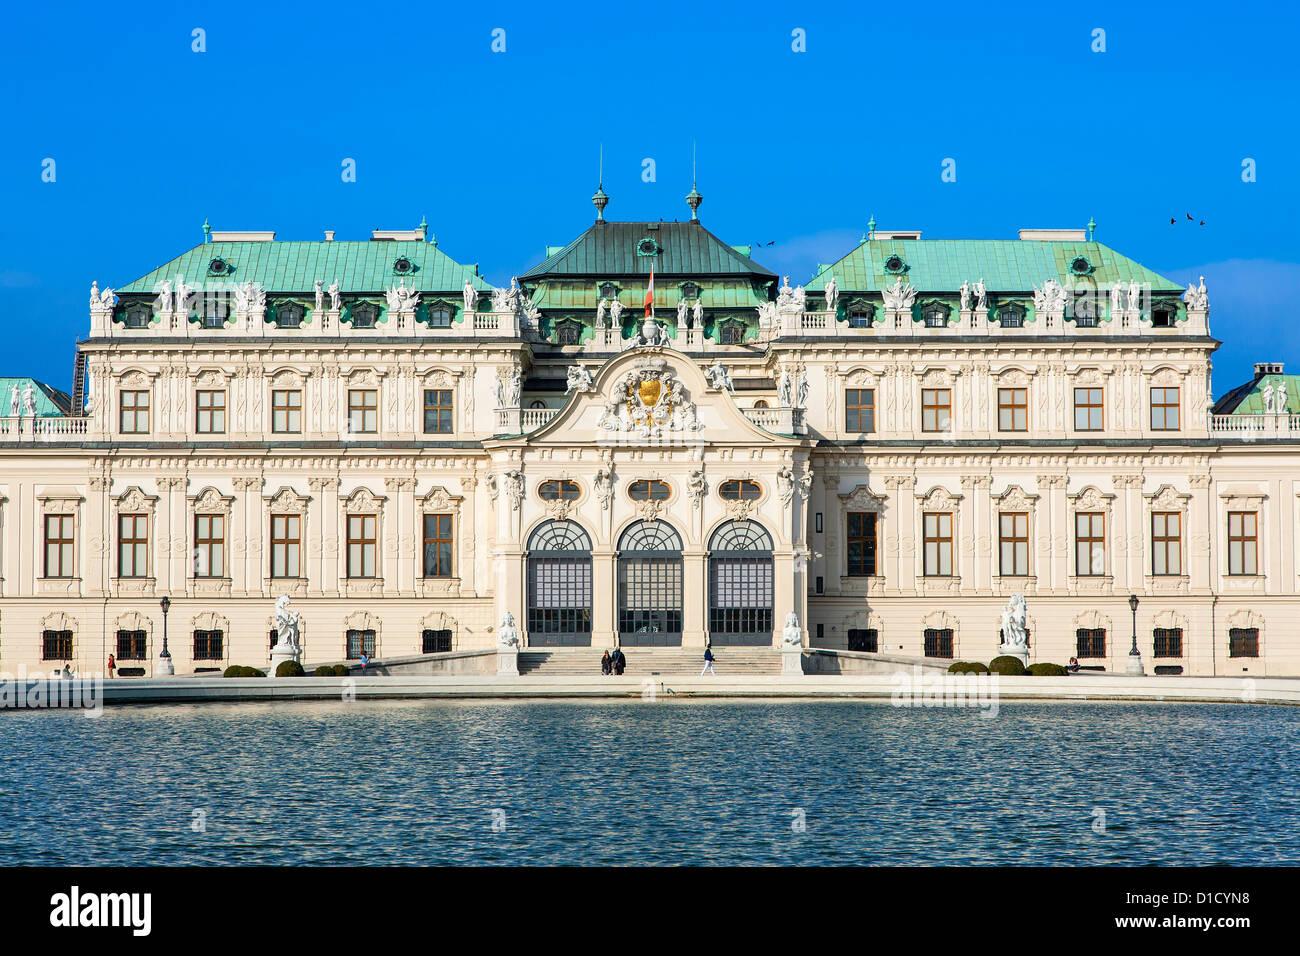 Austria, Vienna, Belvedere Palace - Stock Image